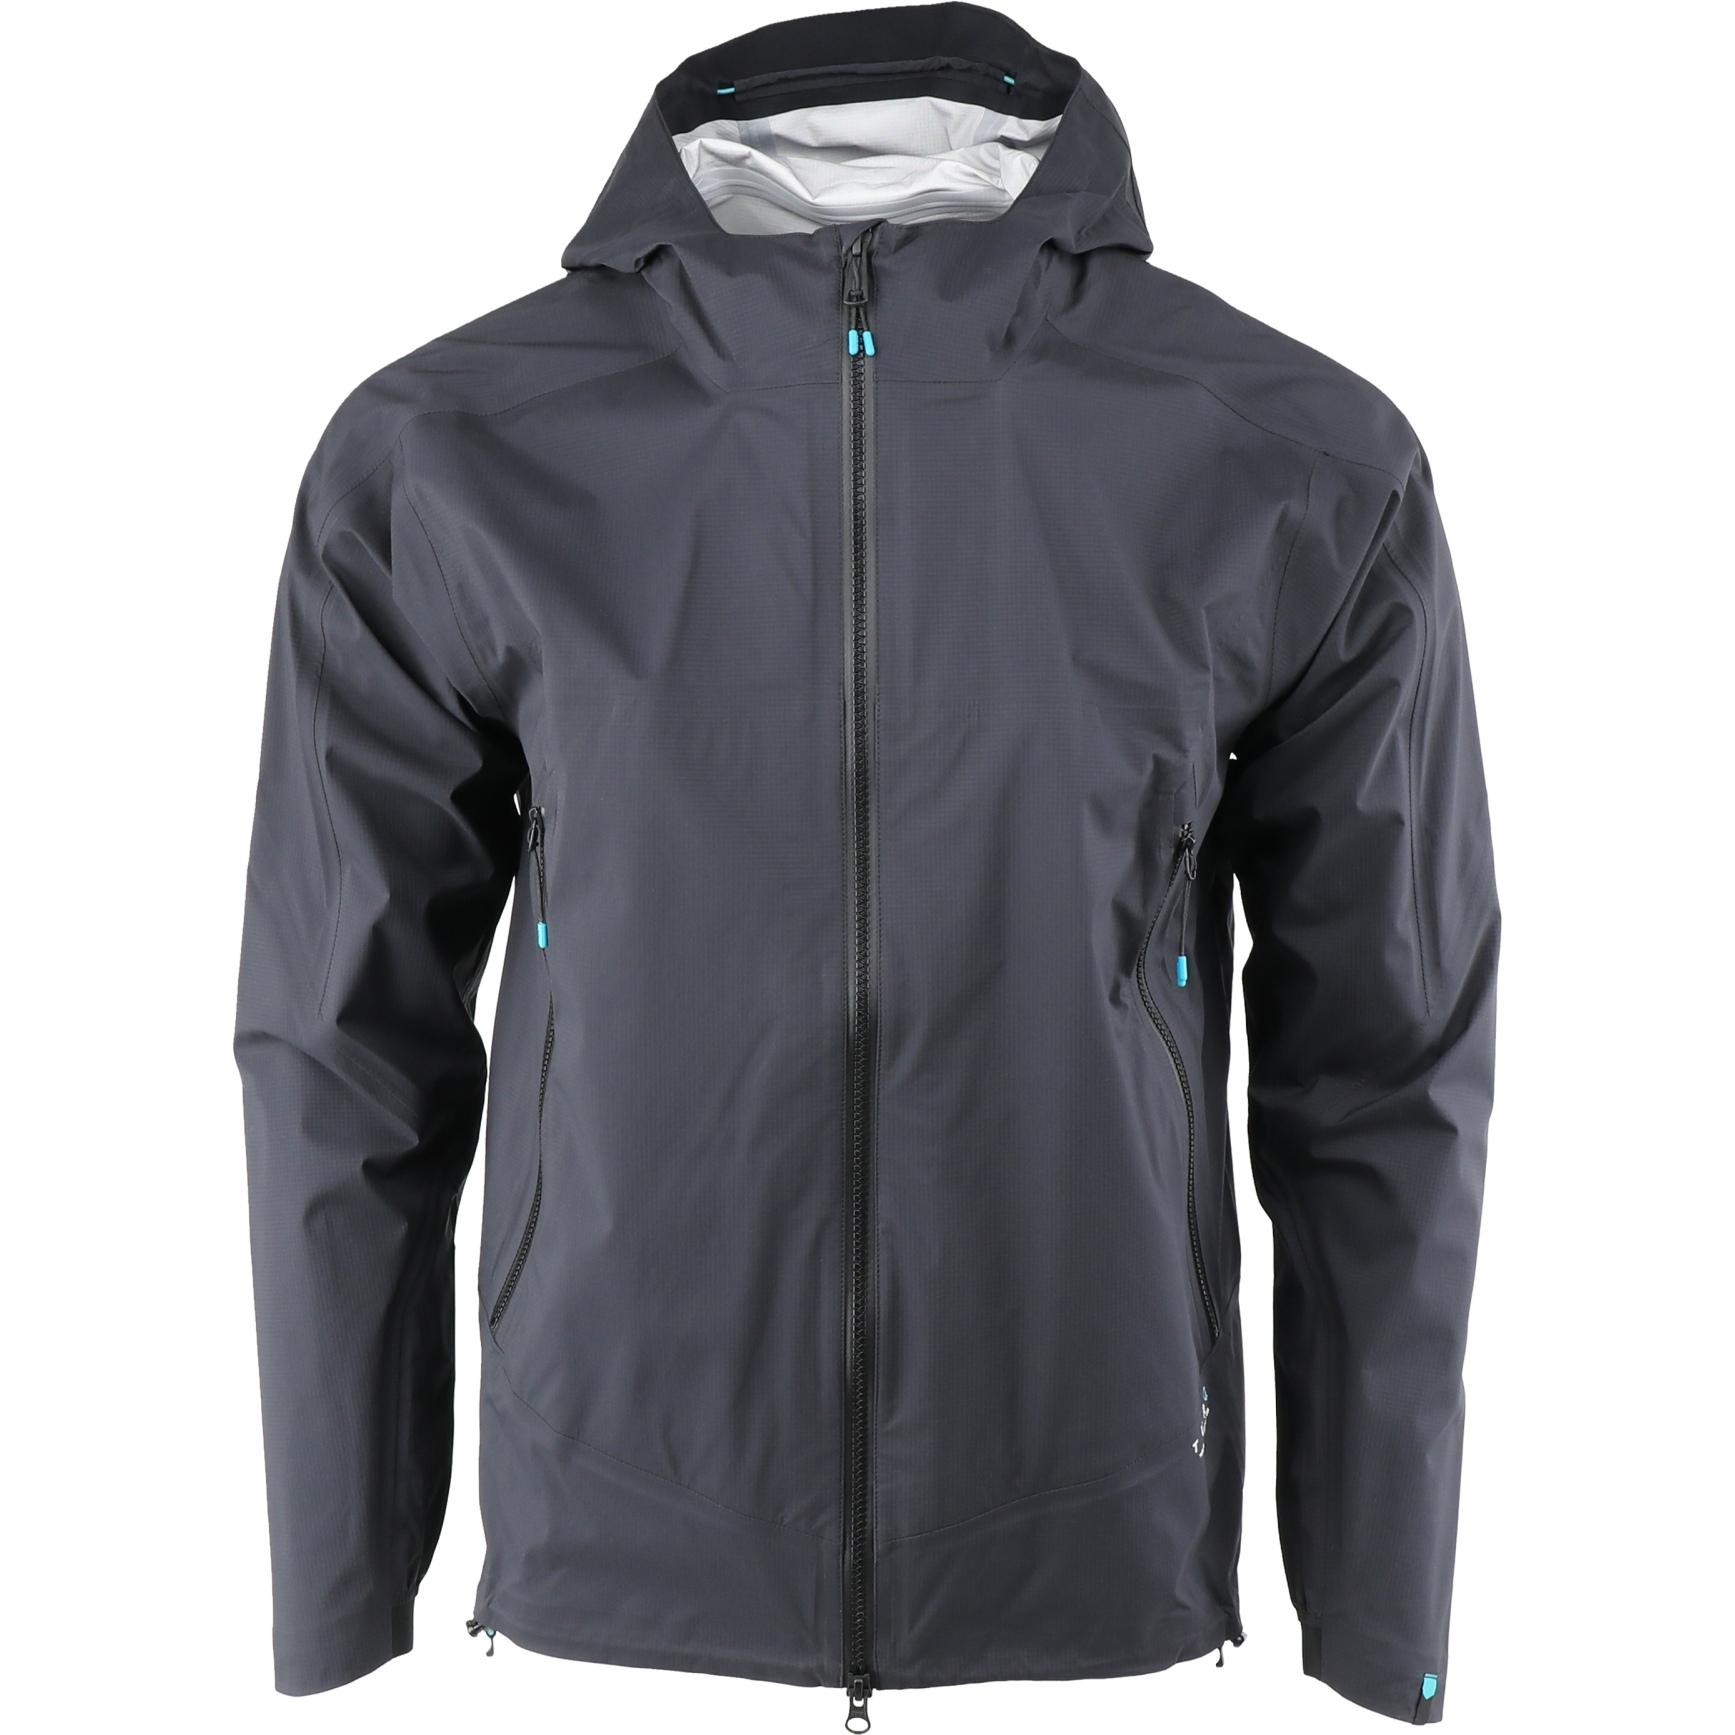 Yeti Cycles TURQ Commit Jacket - Black